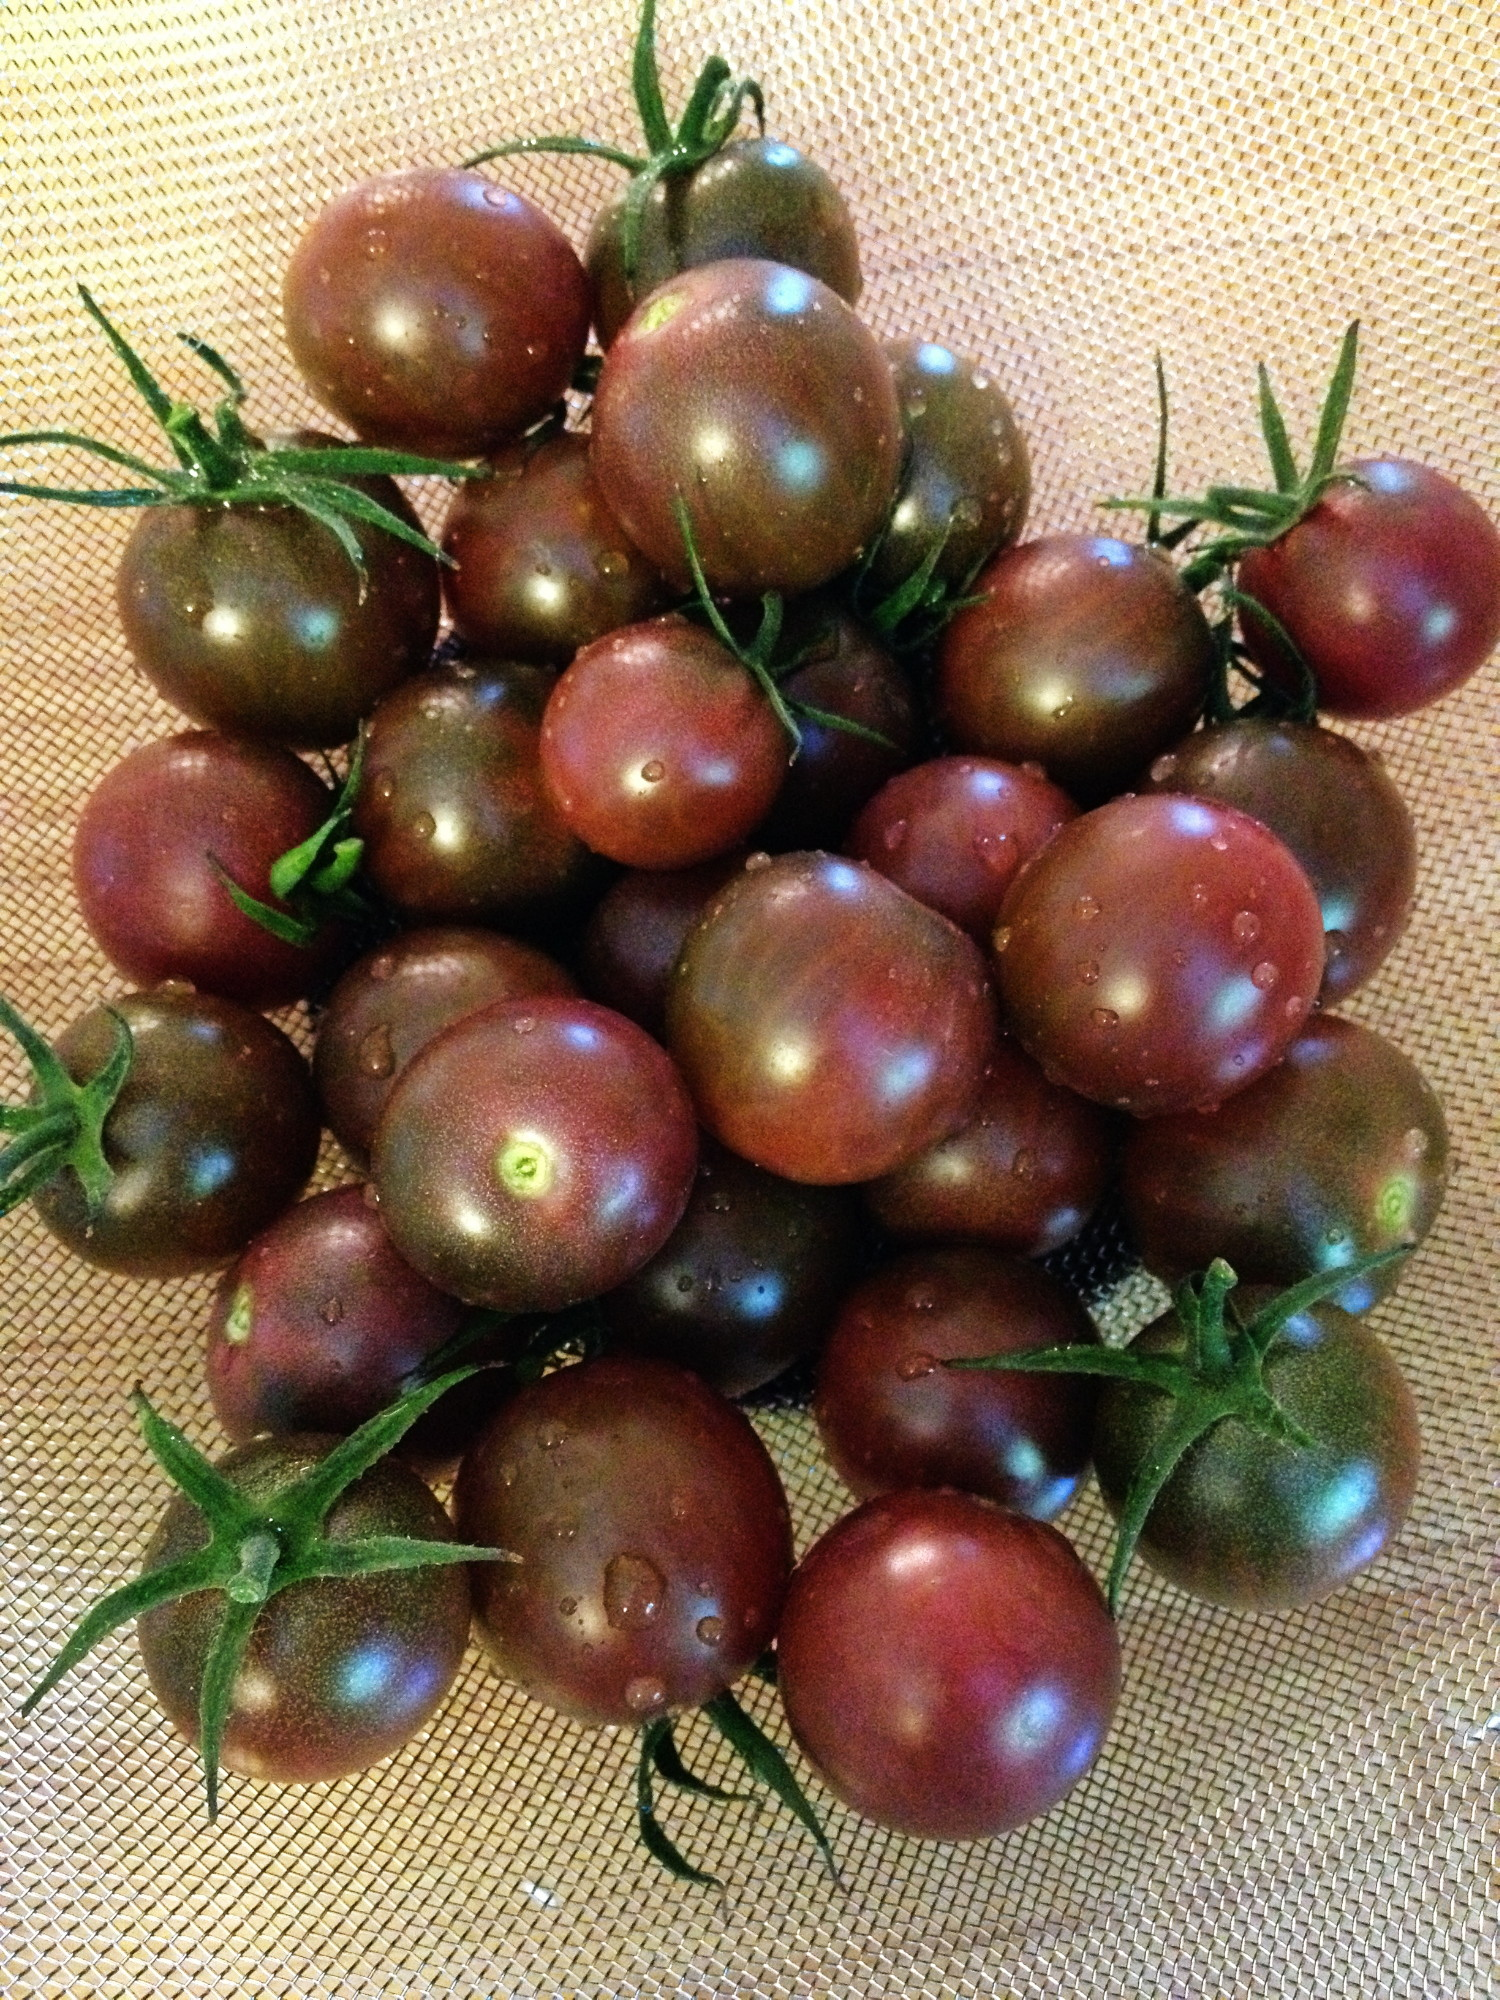 Chocolate Cherry Tomato Seeds - 150 Milligrams - GARDEN FRESH PACK ...